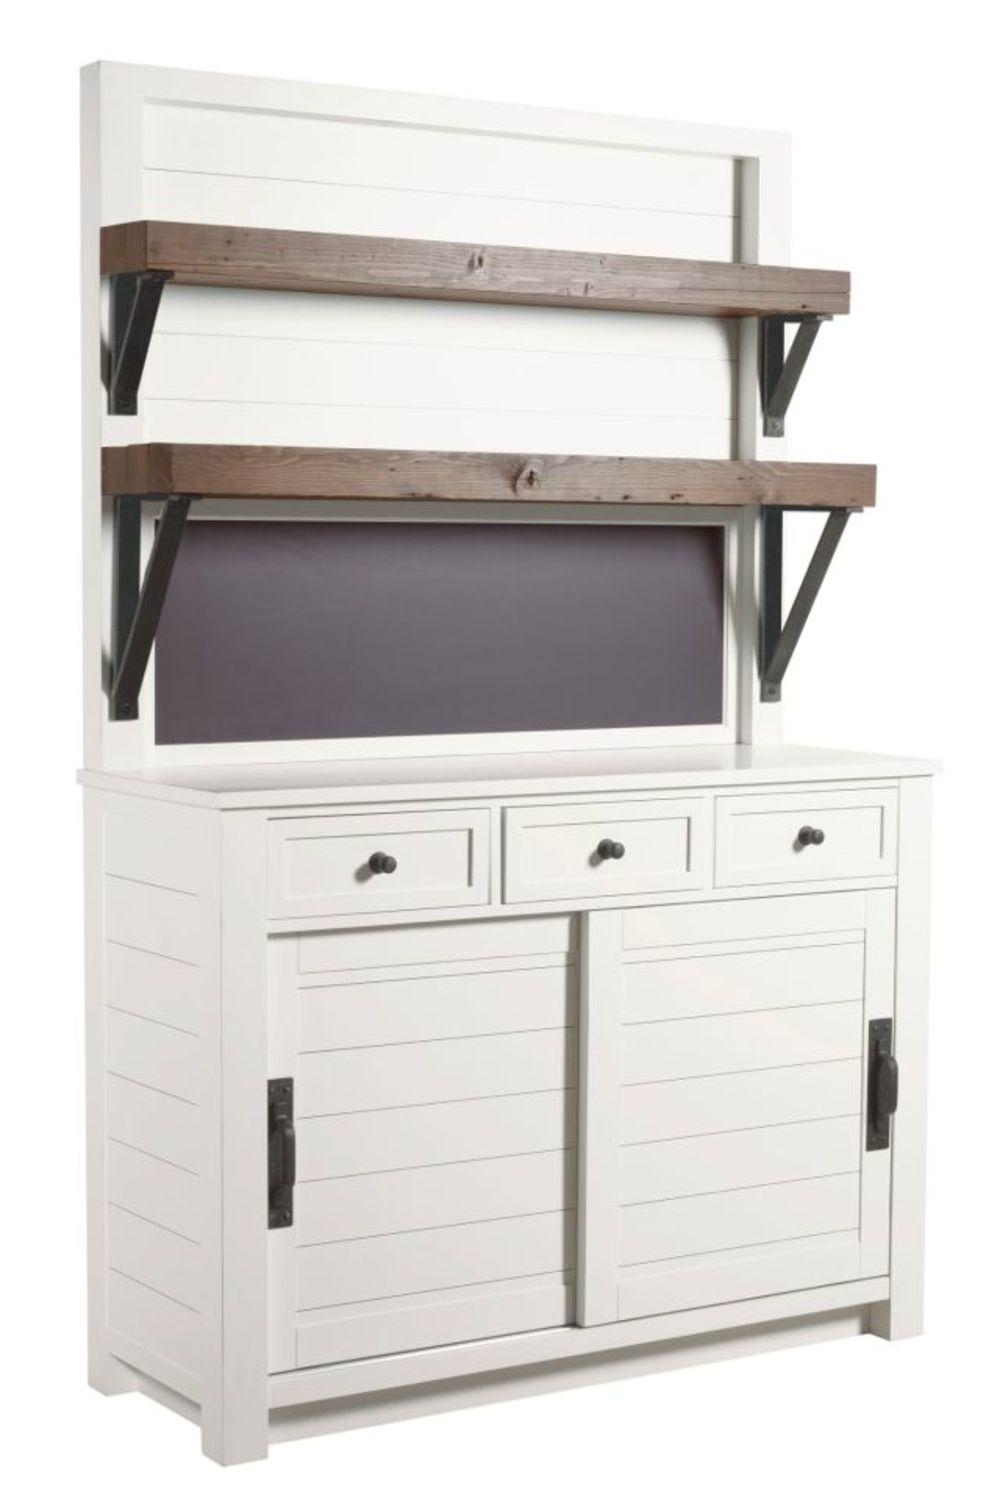 Hammary Furniture - Shiplap Cupboard